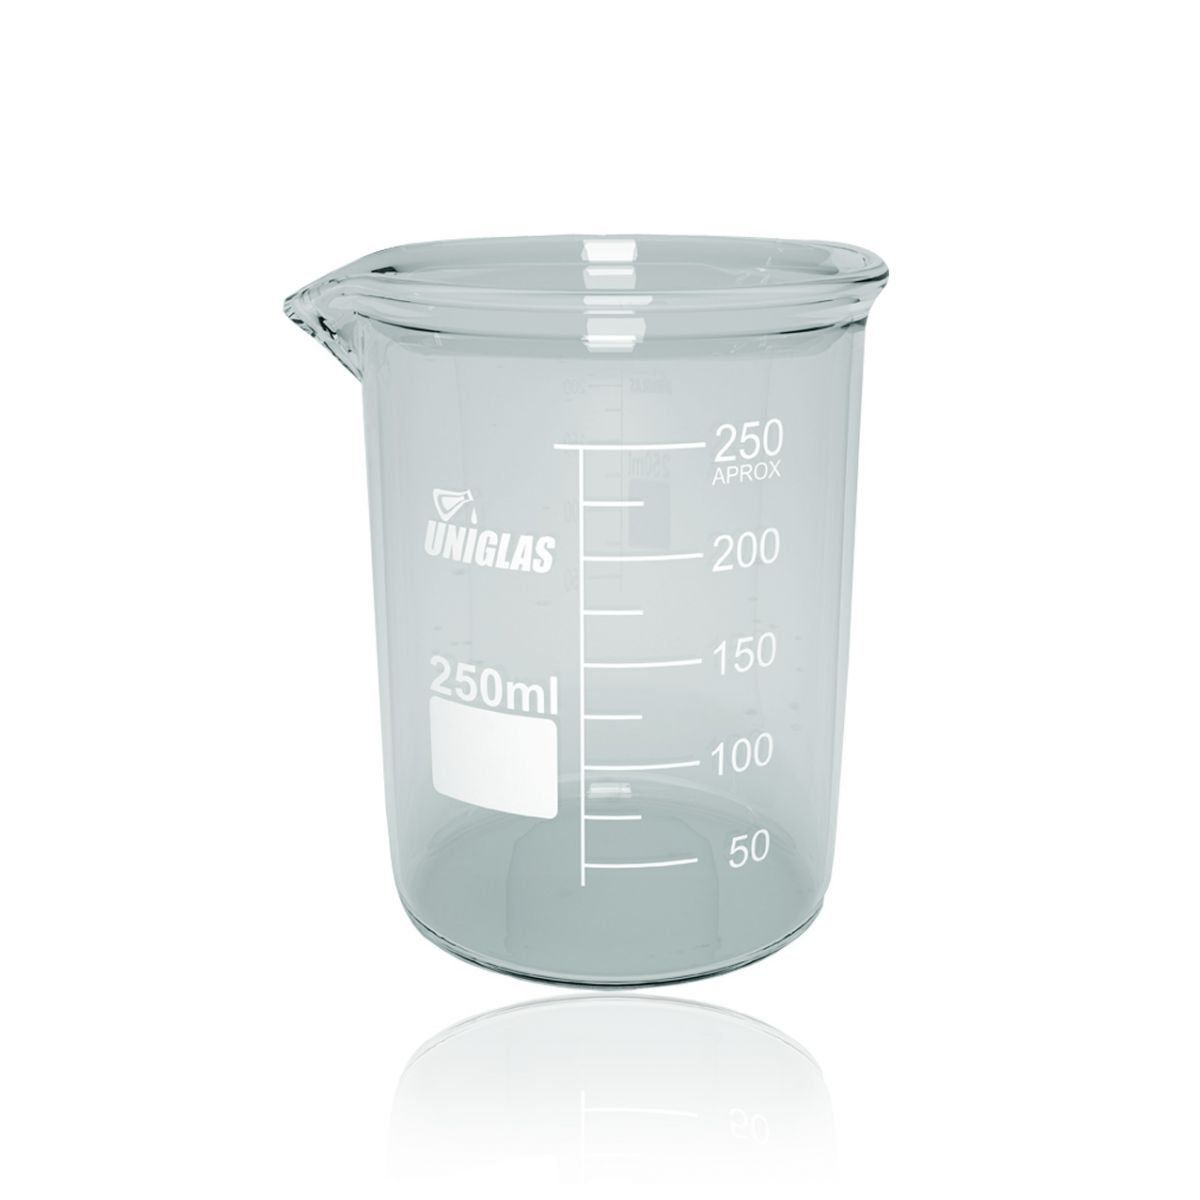 Copo Becker FB (Griffin) Graduado 1000 ml - CAIXA com 6 und. Uniglas